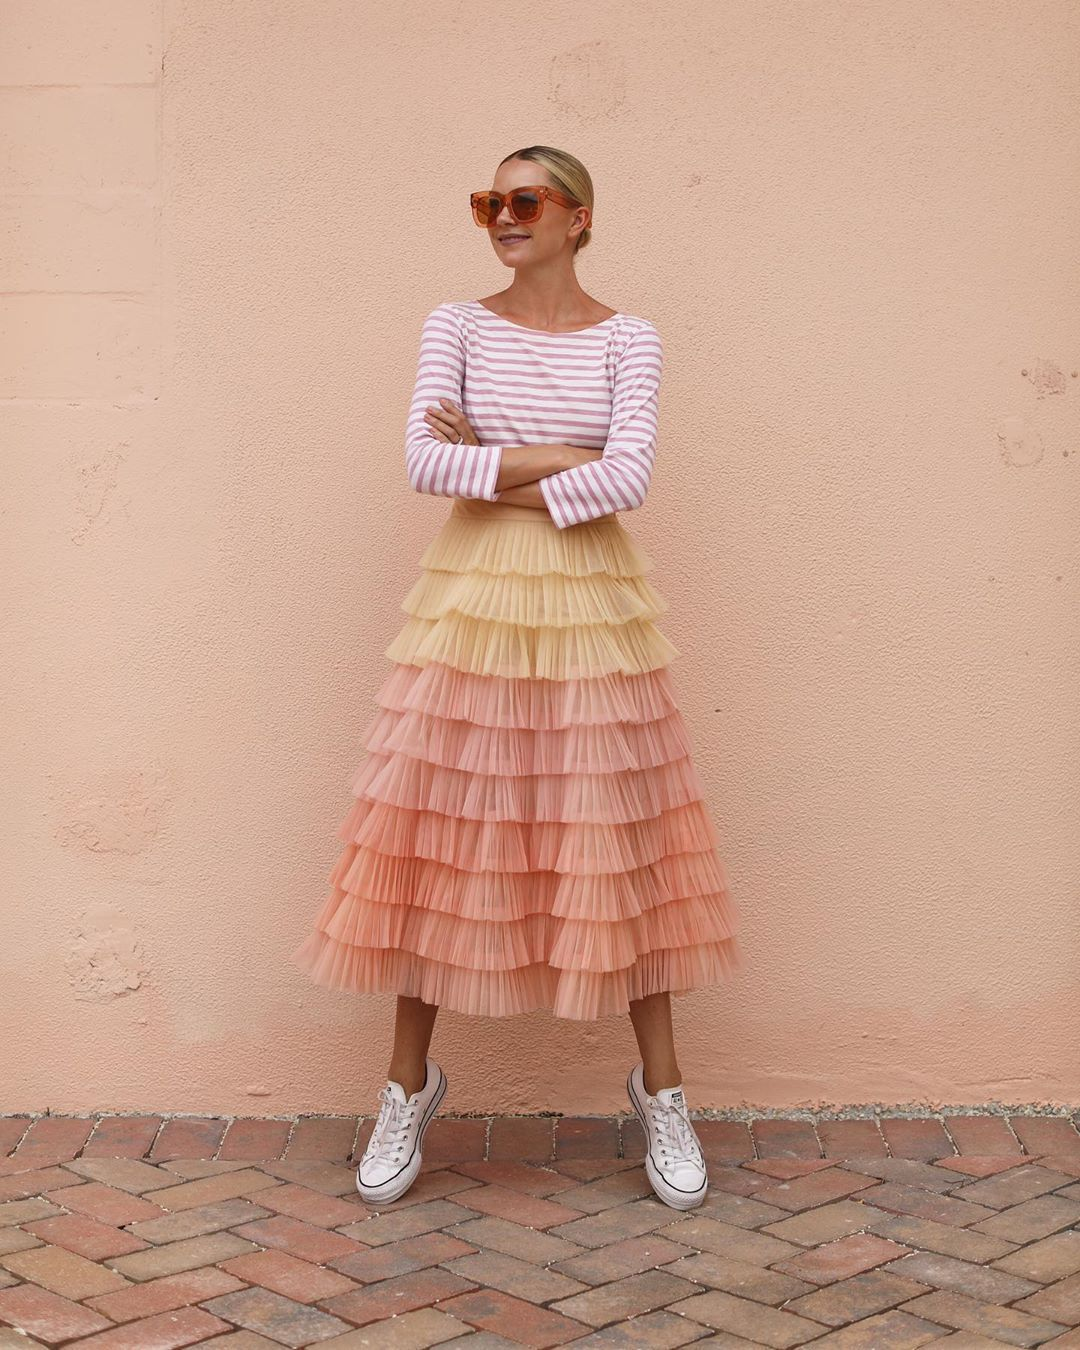 top striped top long sleeves tulle skirt midi skirt sneakers converse